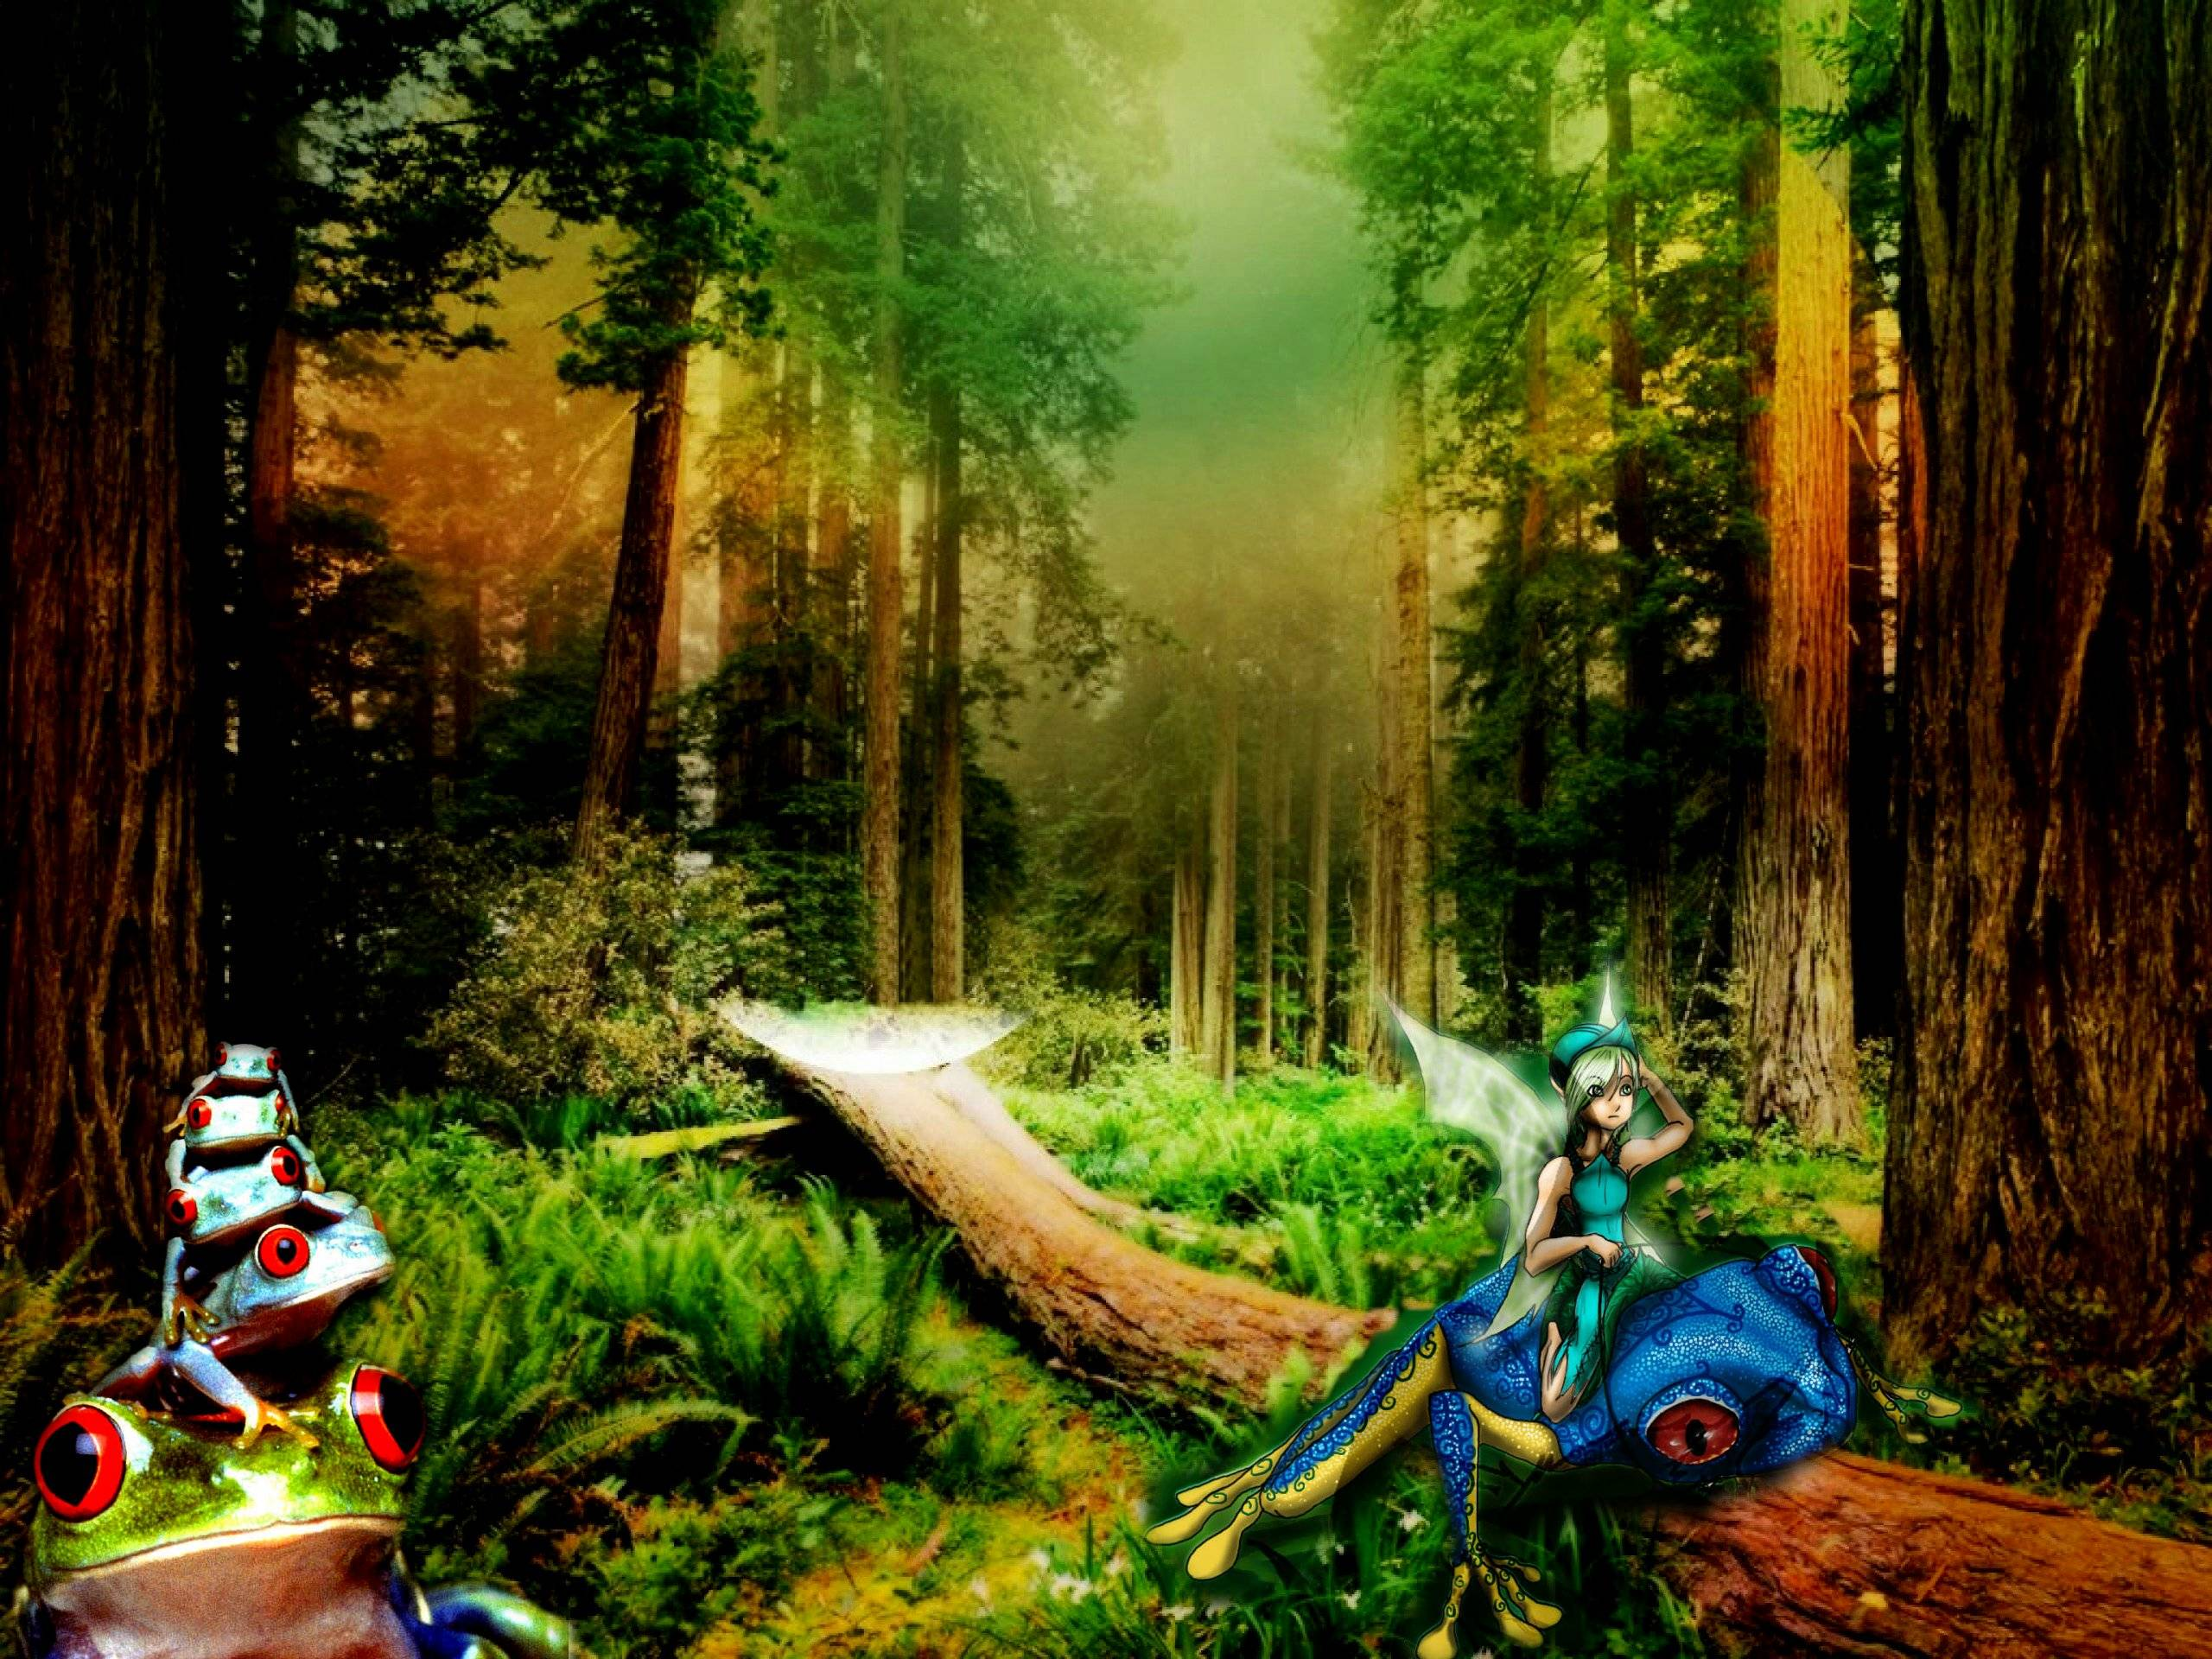 enchanted forest background - photo #25